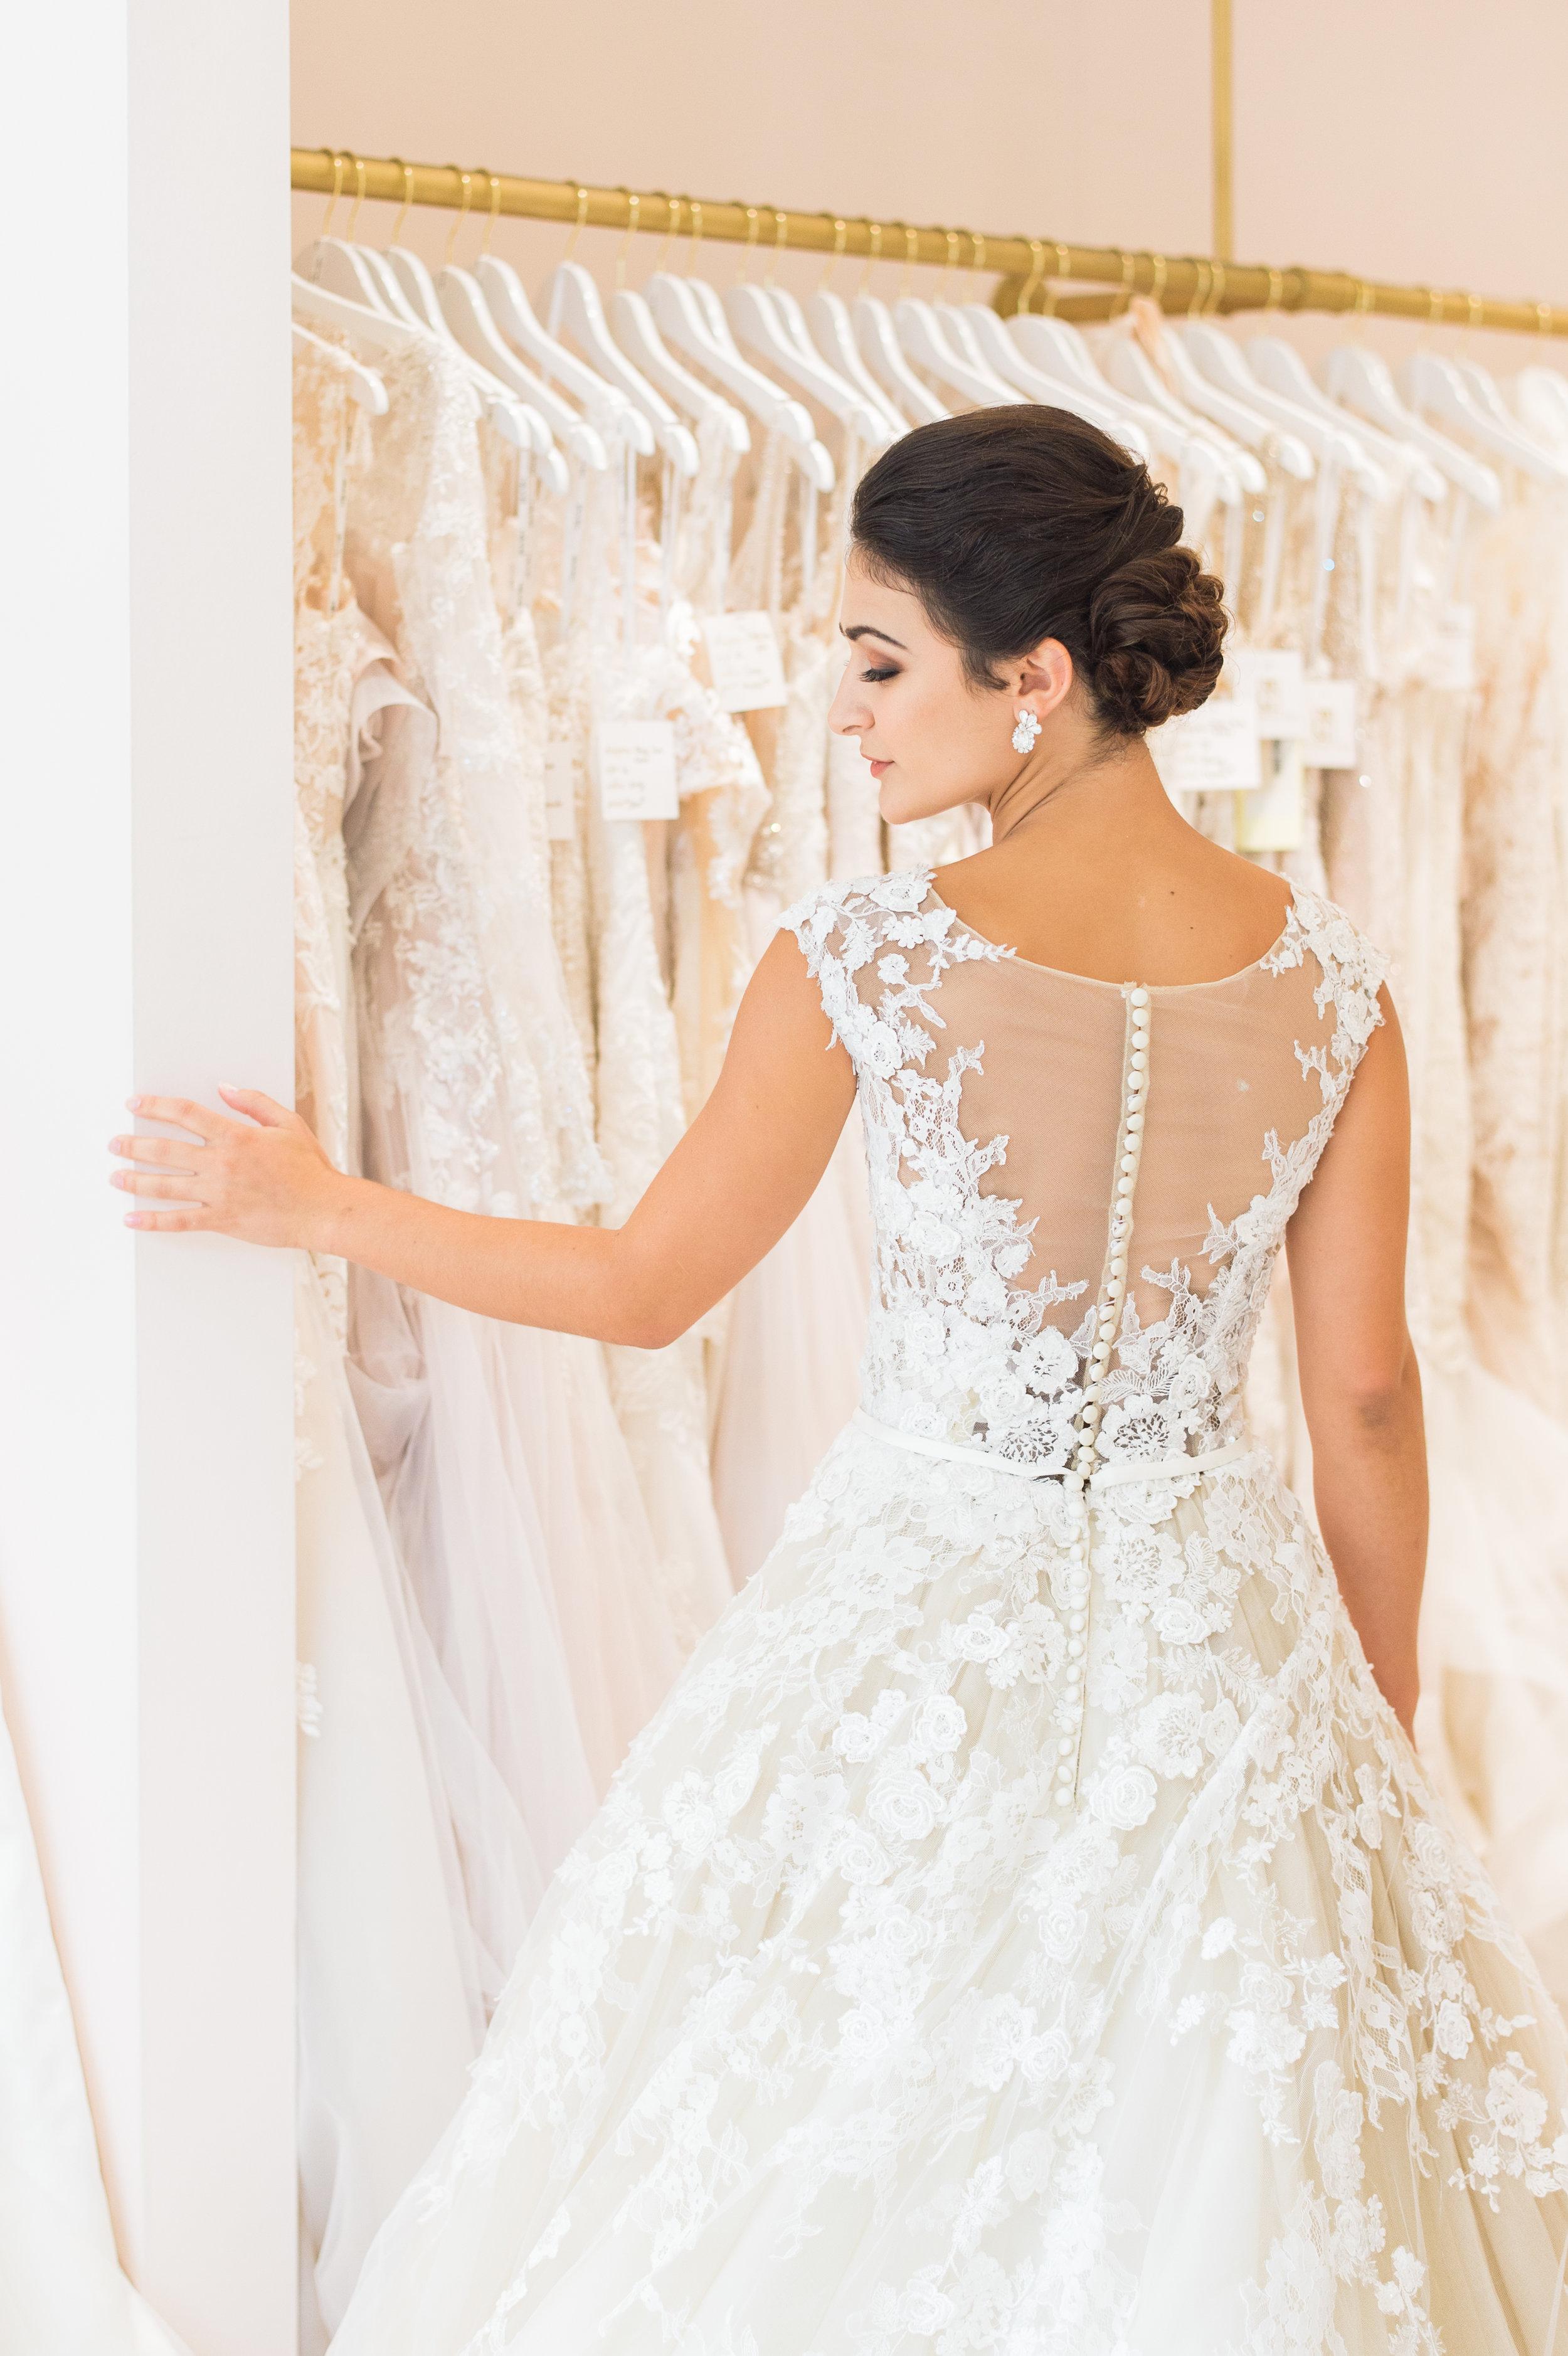 luck love photography - northern virginia wedding photographer - the bridal room va - the dresses-69.jpg